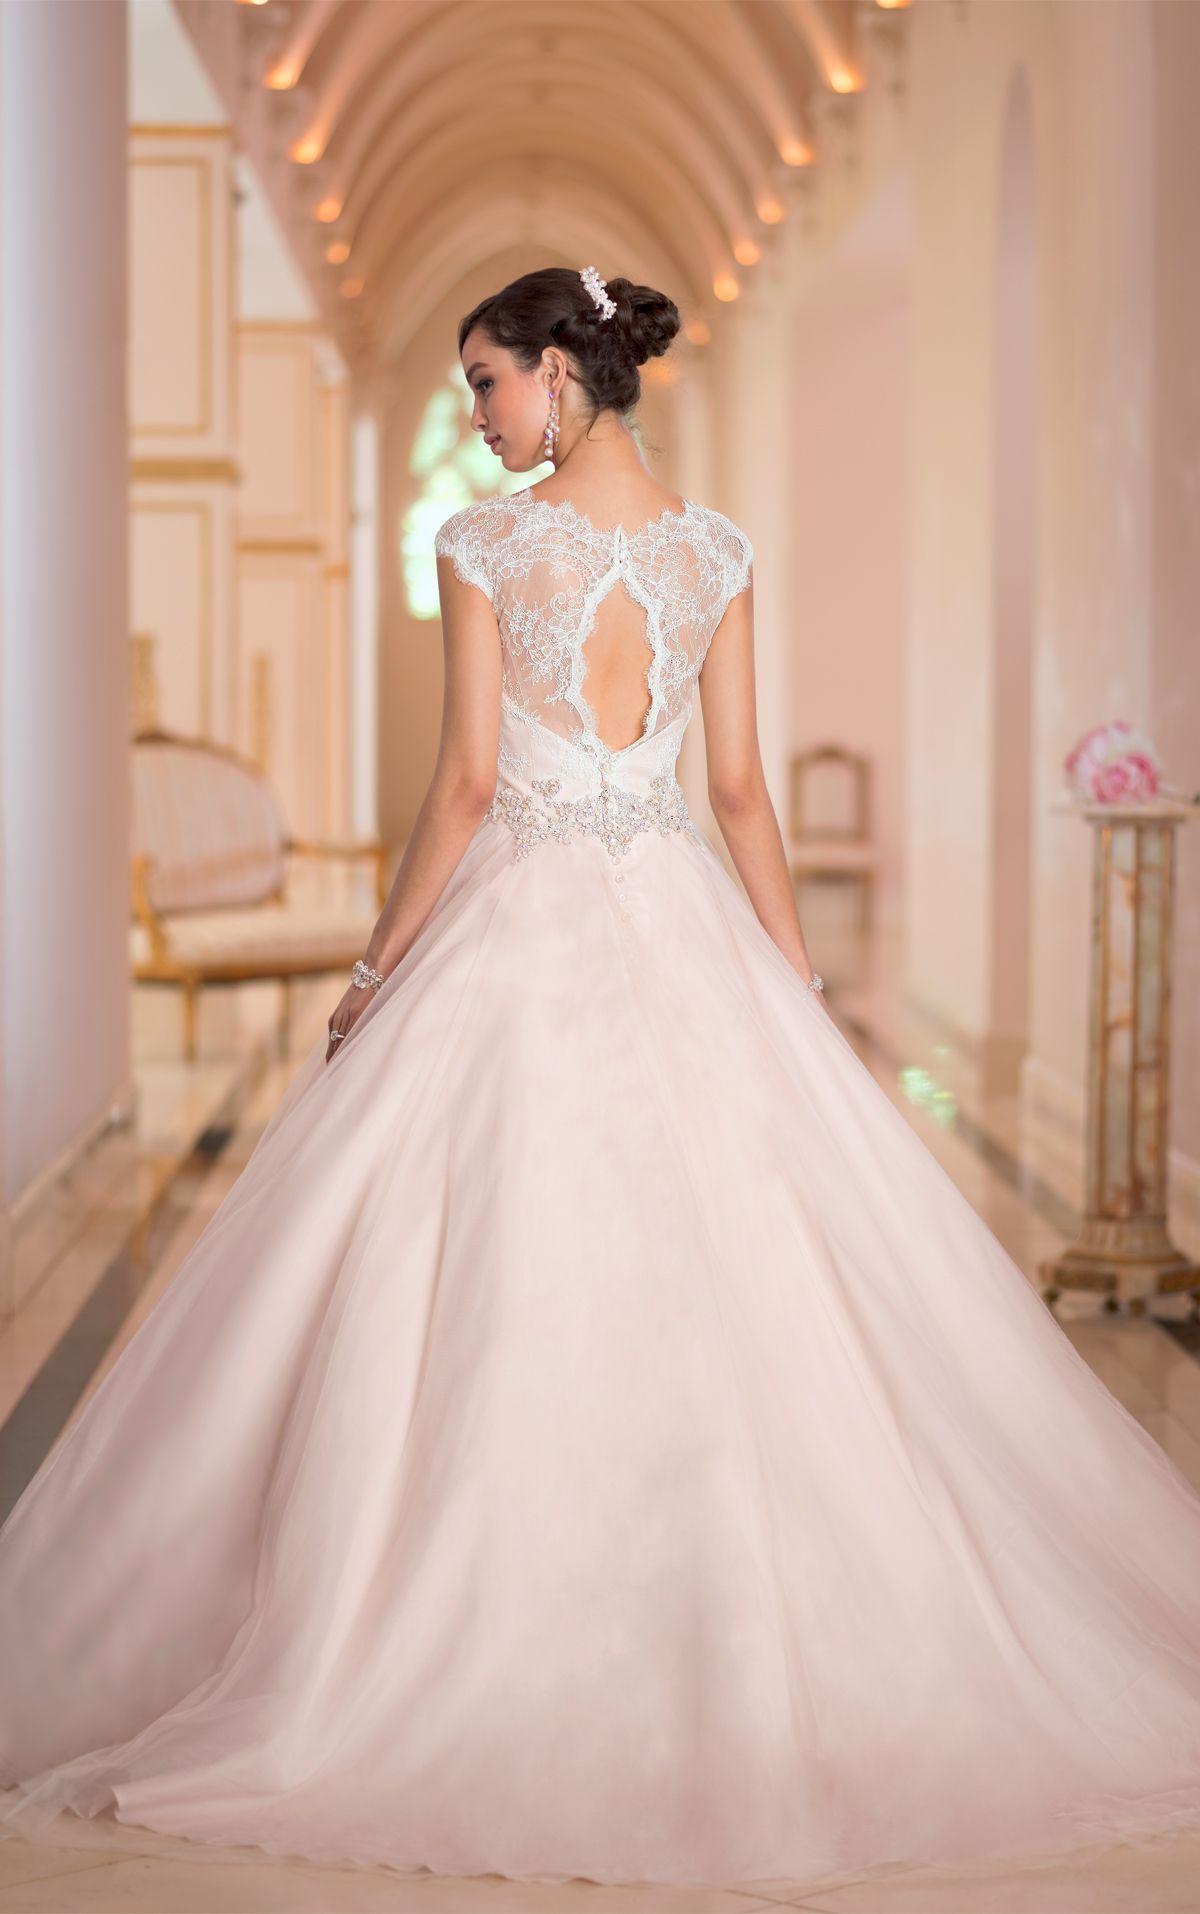 Mod wedding dress  Sexy and Extravagant Stella York Wedding Dresses   dream